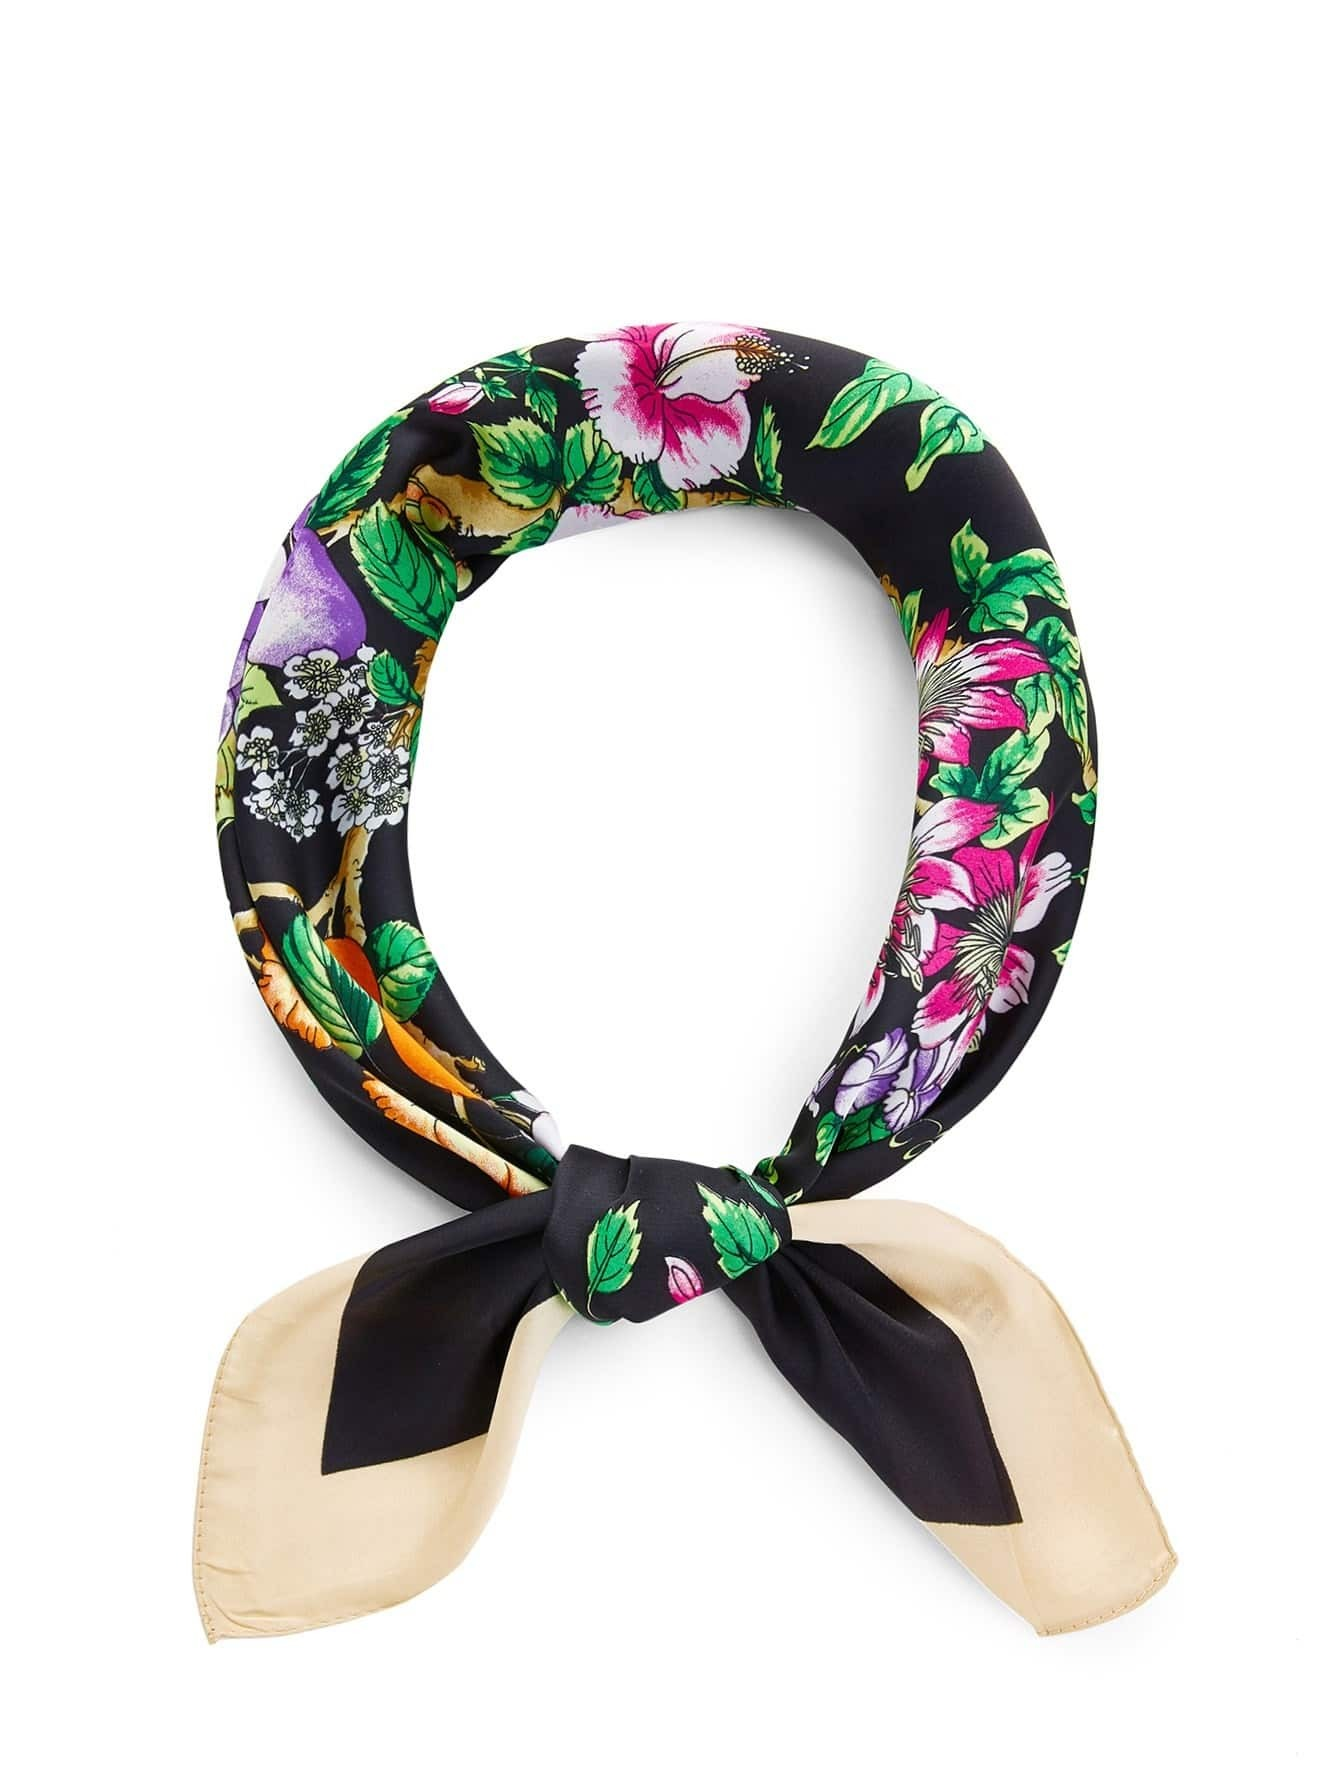 Flower Print Bandana calico print satin bandana